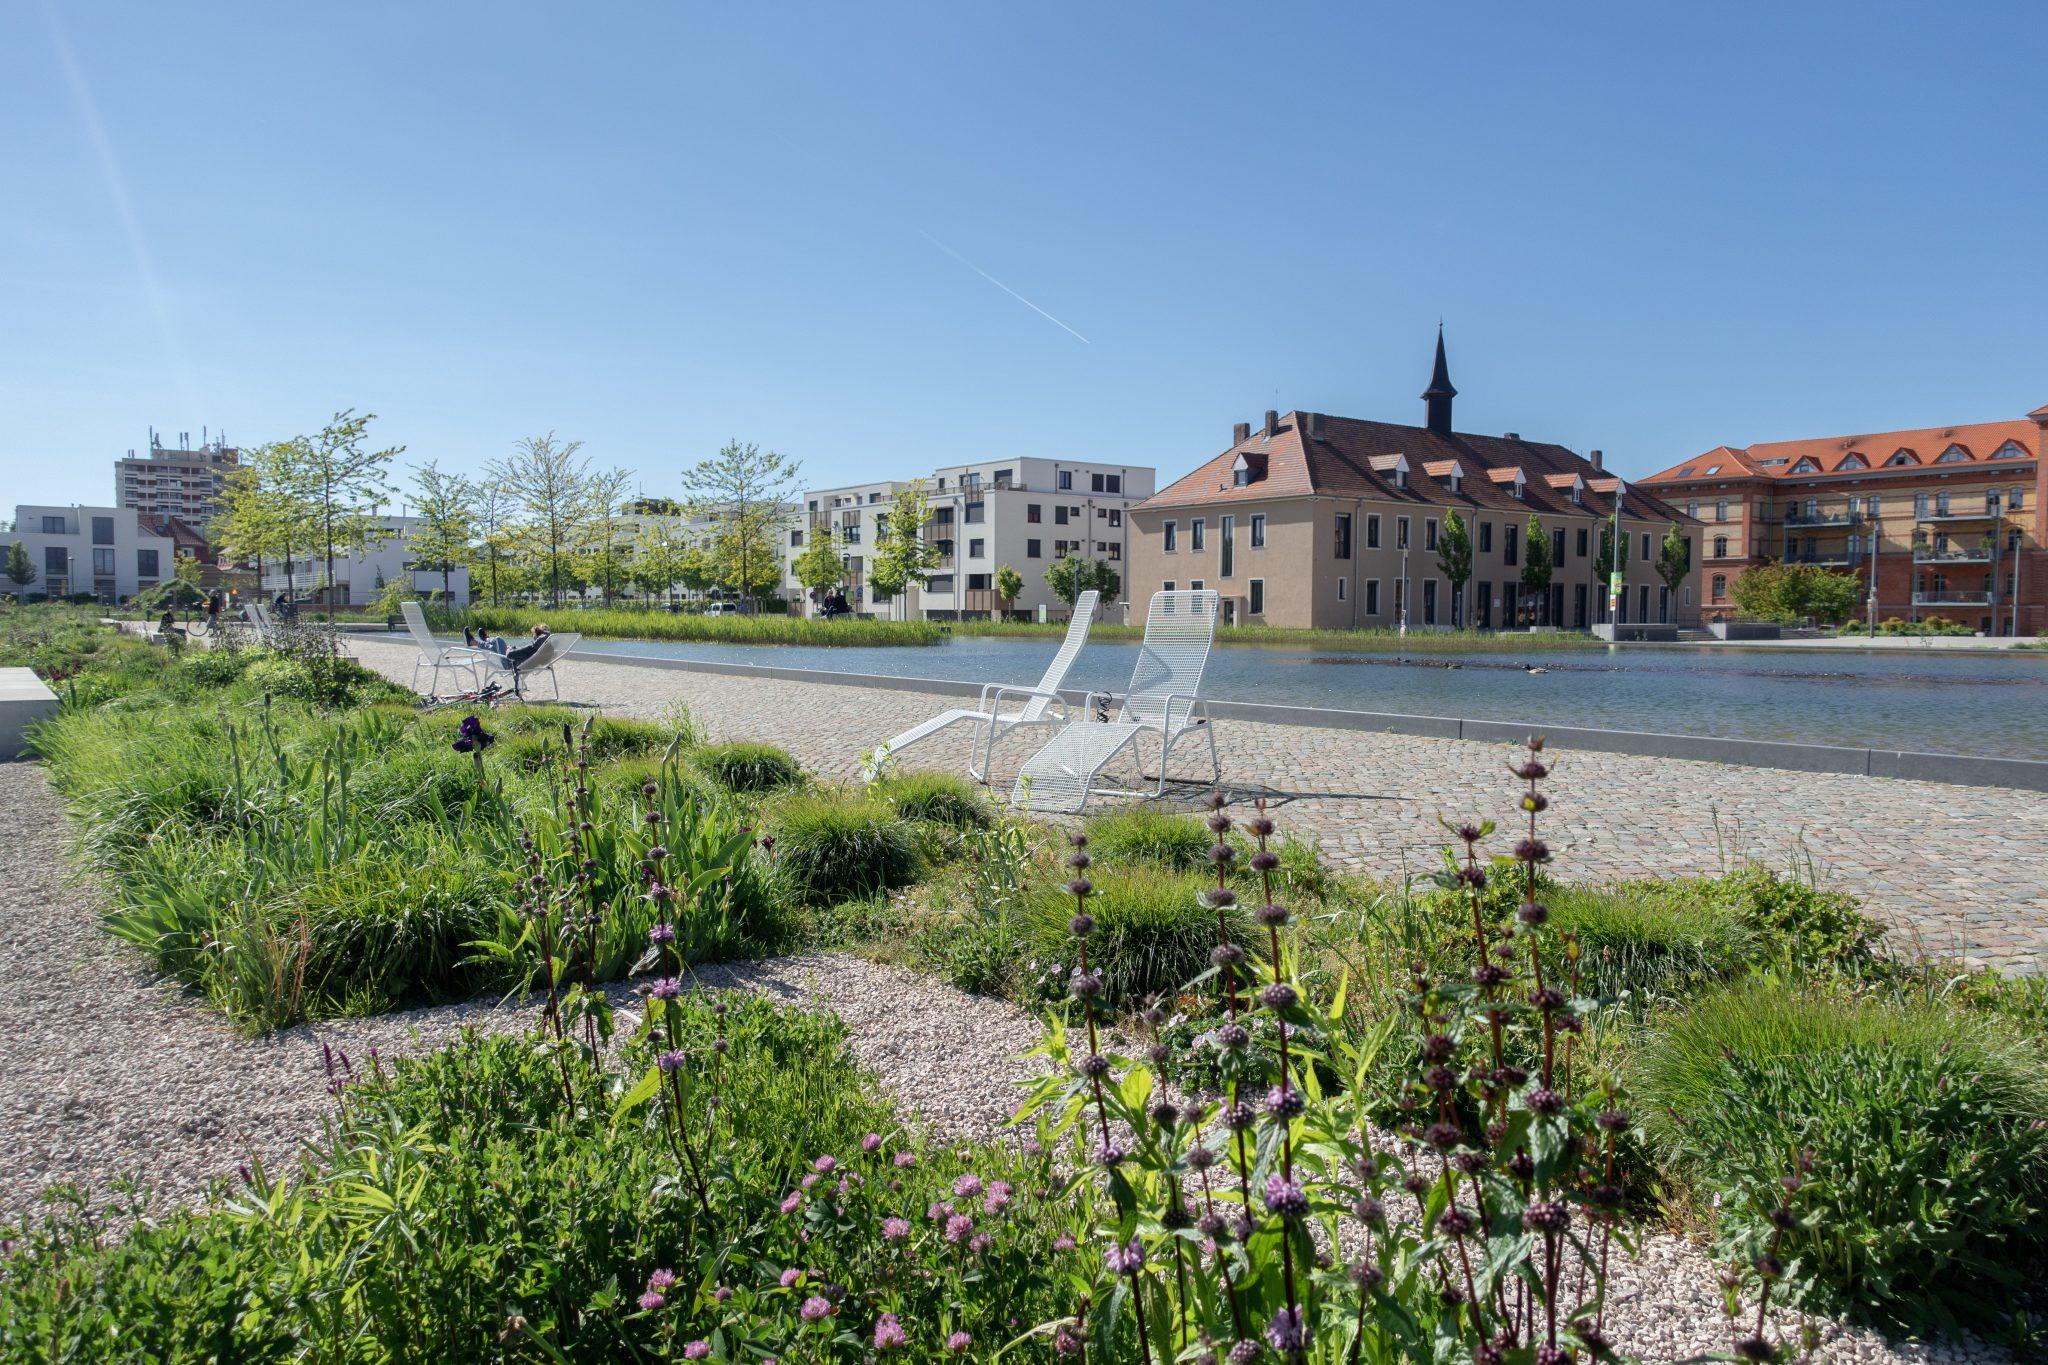 Landau-pfalz-sehenswürdigkeit-südpark-teich